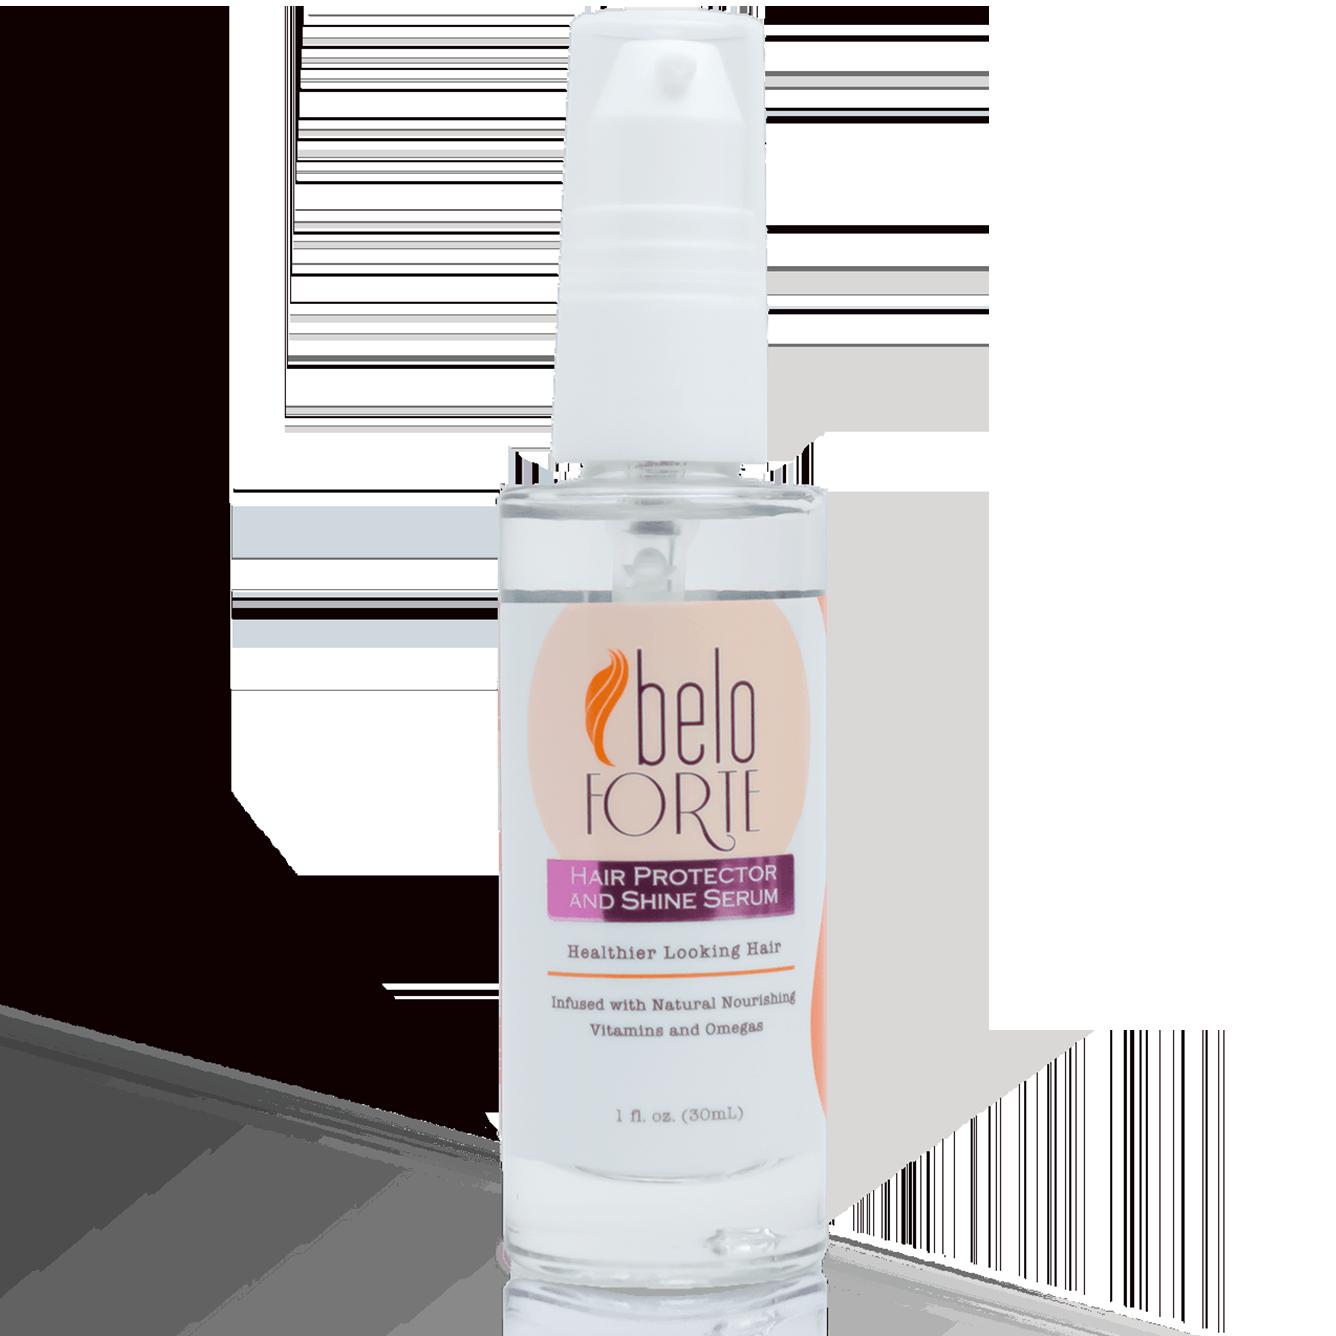 BeloForte Hair Protector & Shine Serum